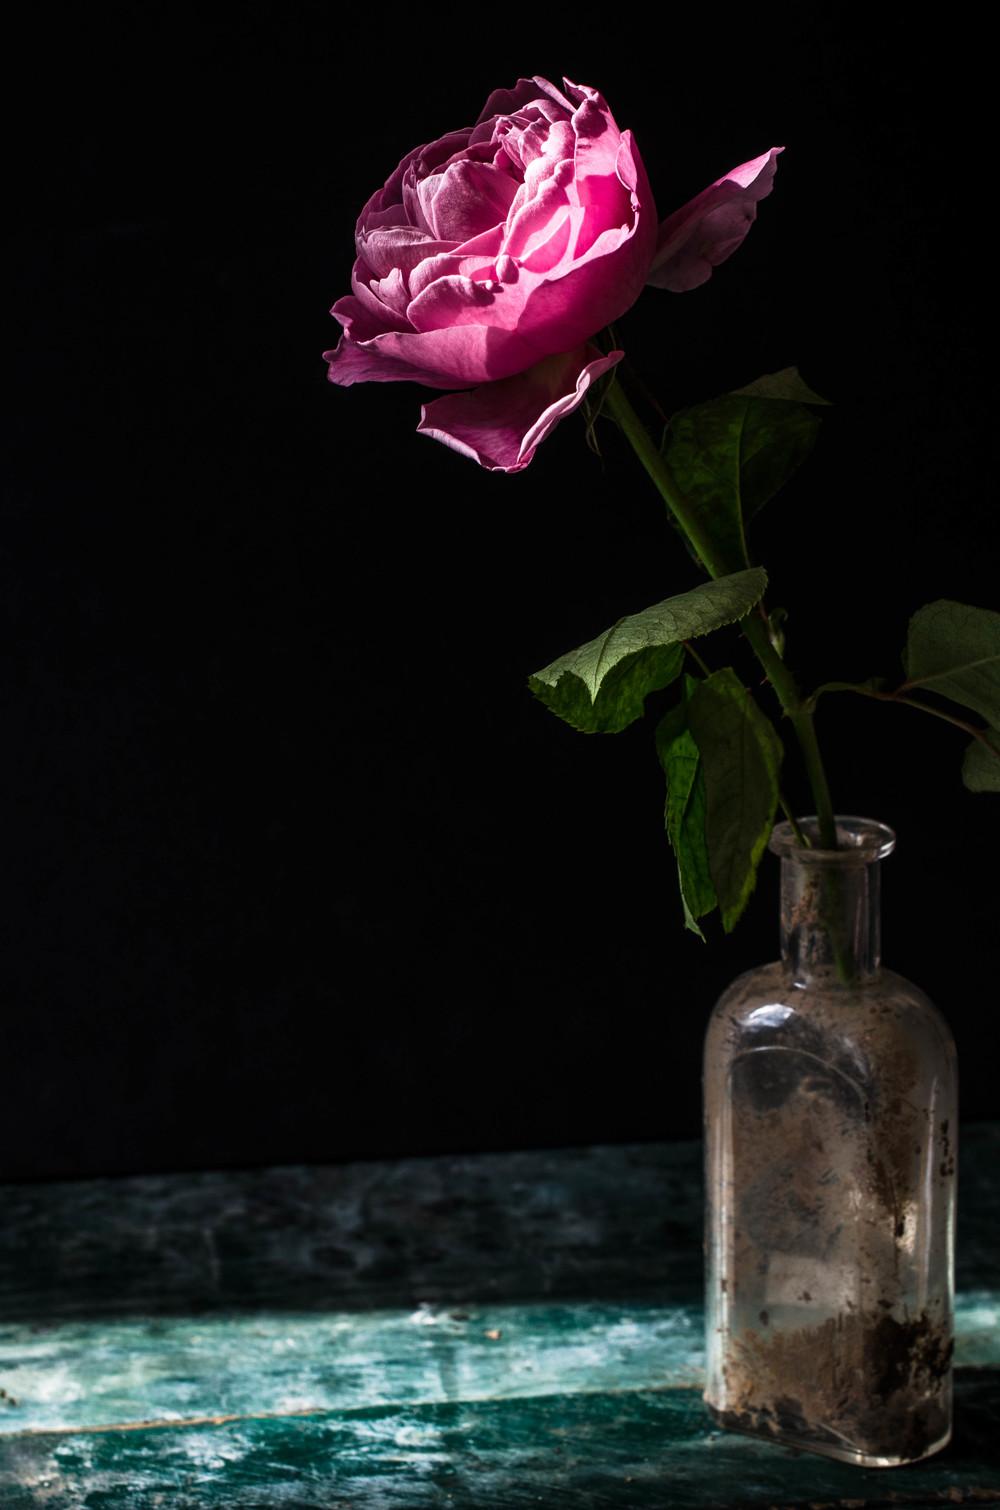 ROSE & IVY JOurnal Petal by Petal David Austin Phoebe